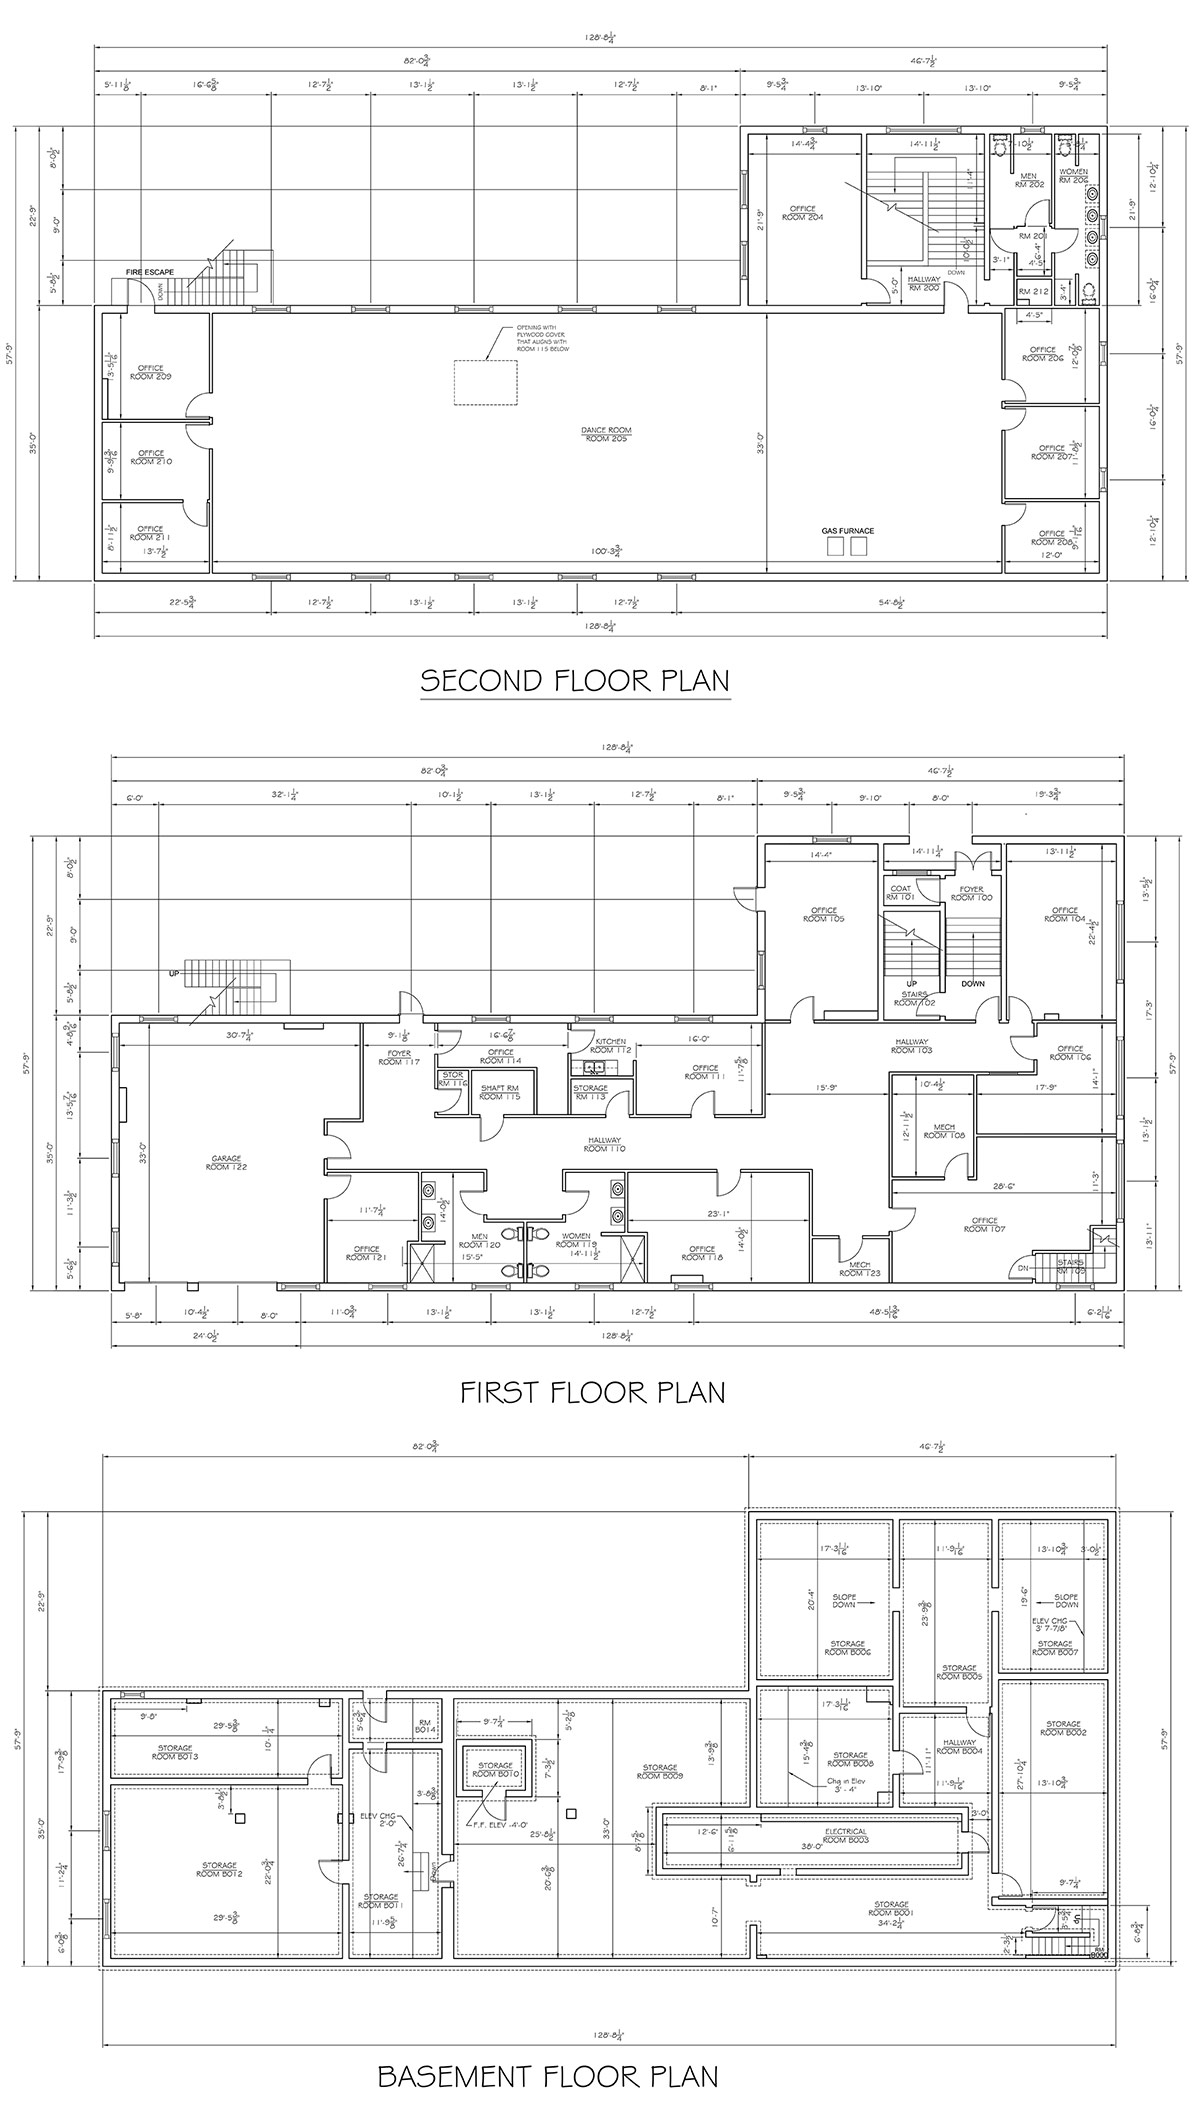 (Courtesy Bing) Floor plans, click to enlarge. (Courtesy Metro Louisville)